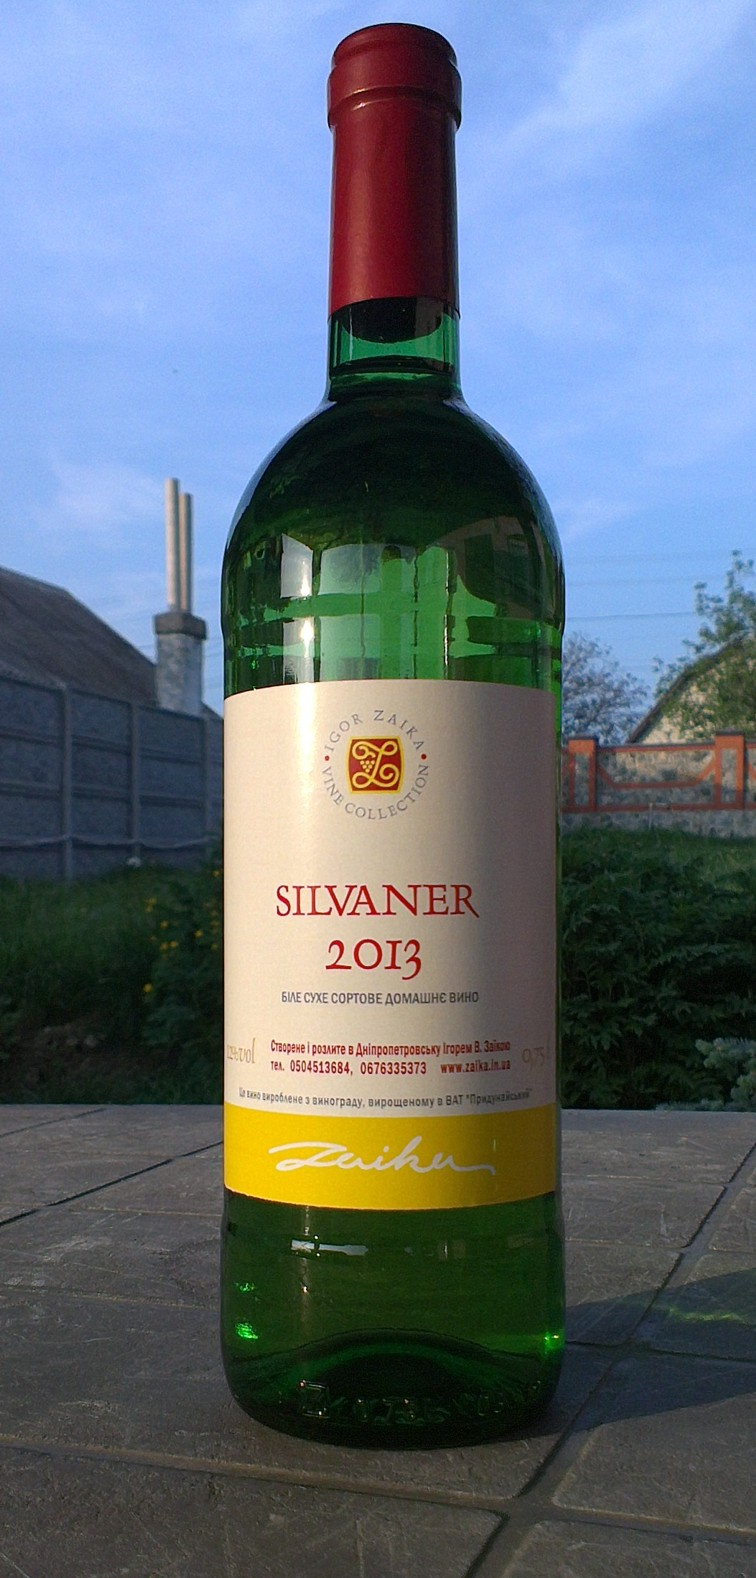 Silvaner 2013